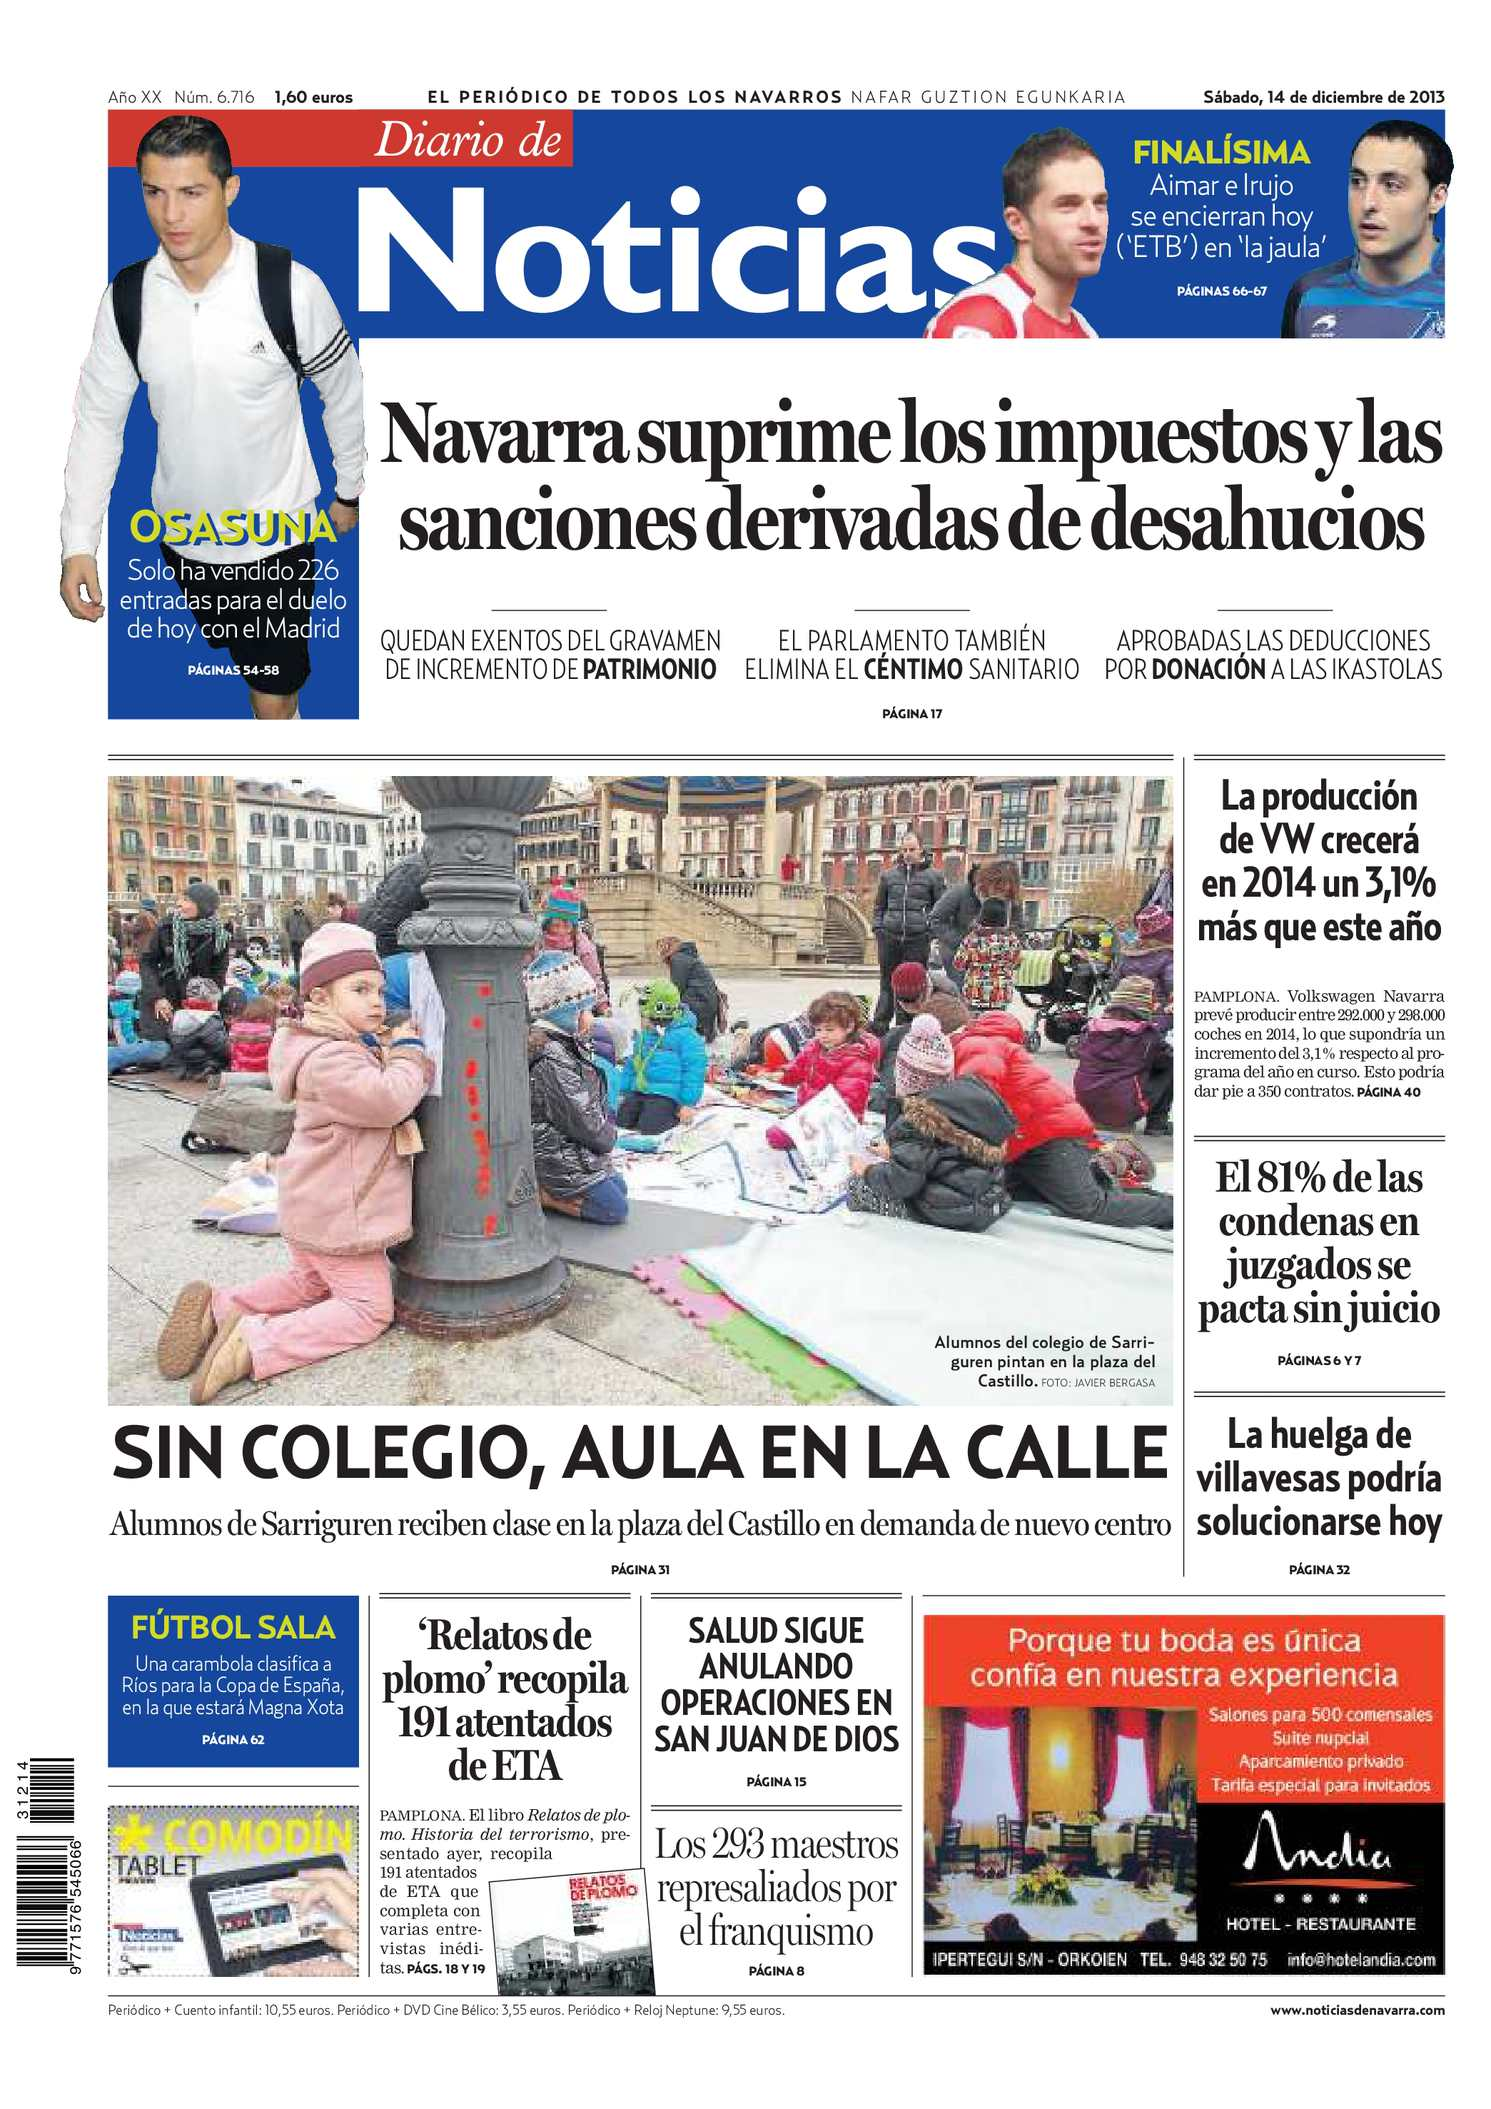 Calaméo - Diario de Noticias 20131214 ca41de30c61